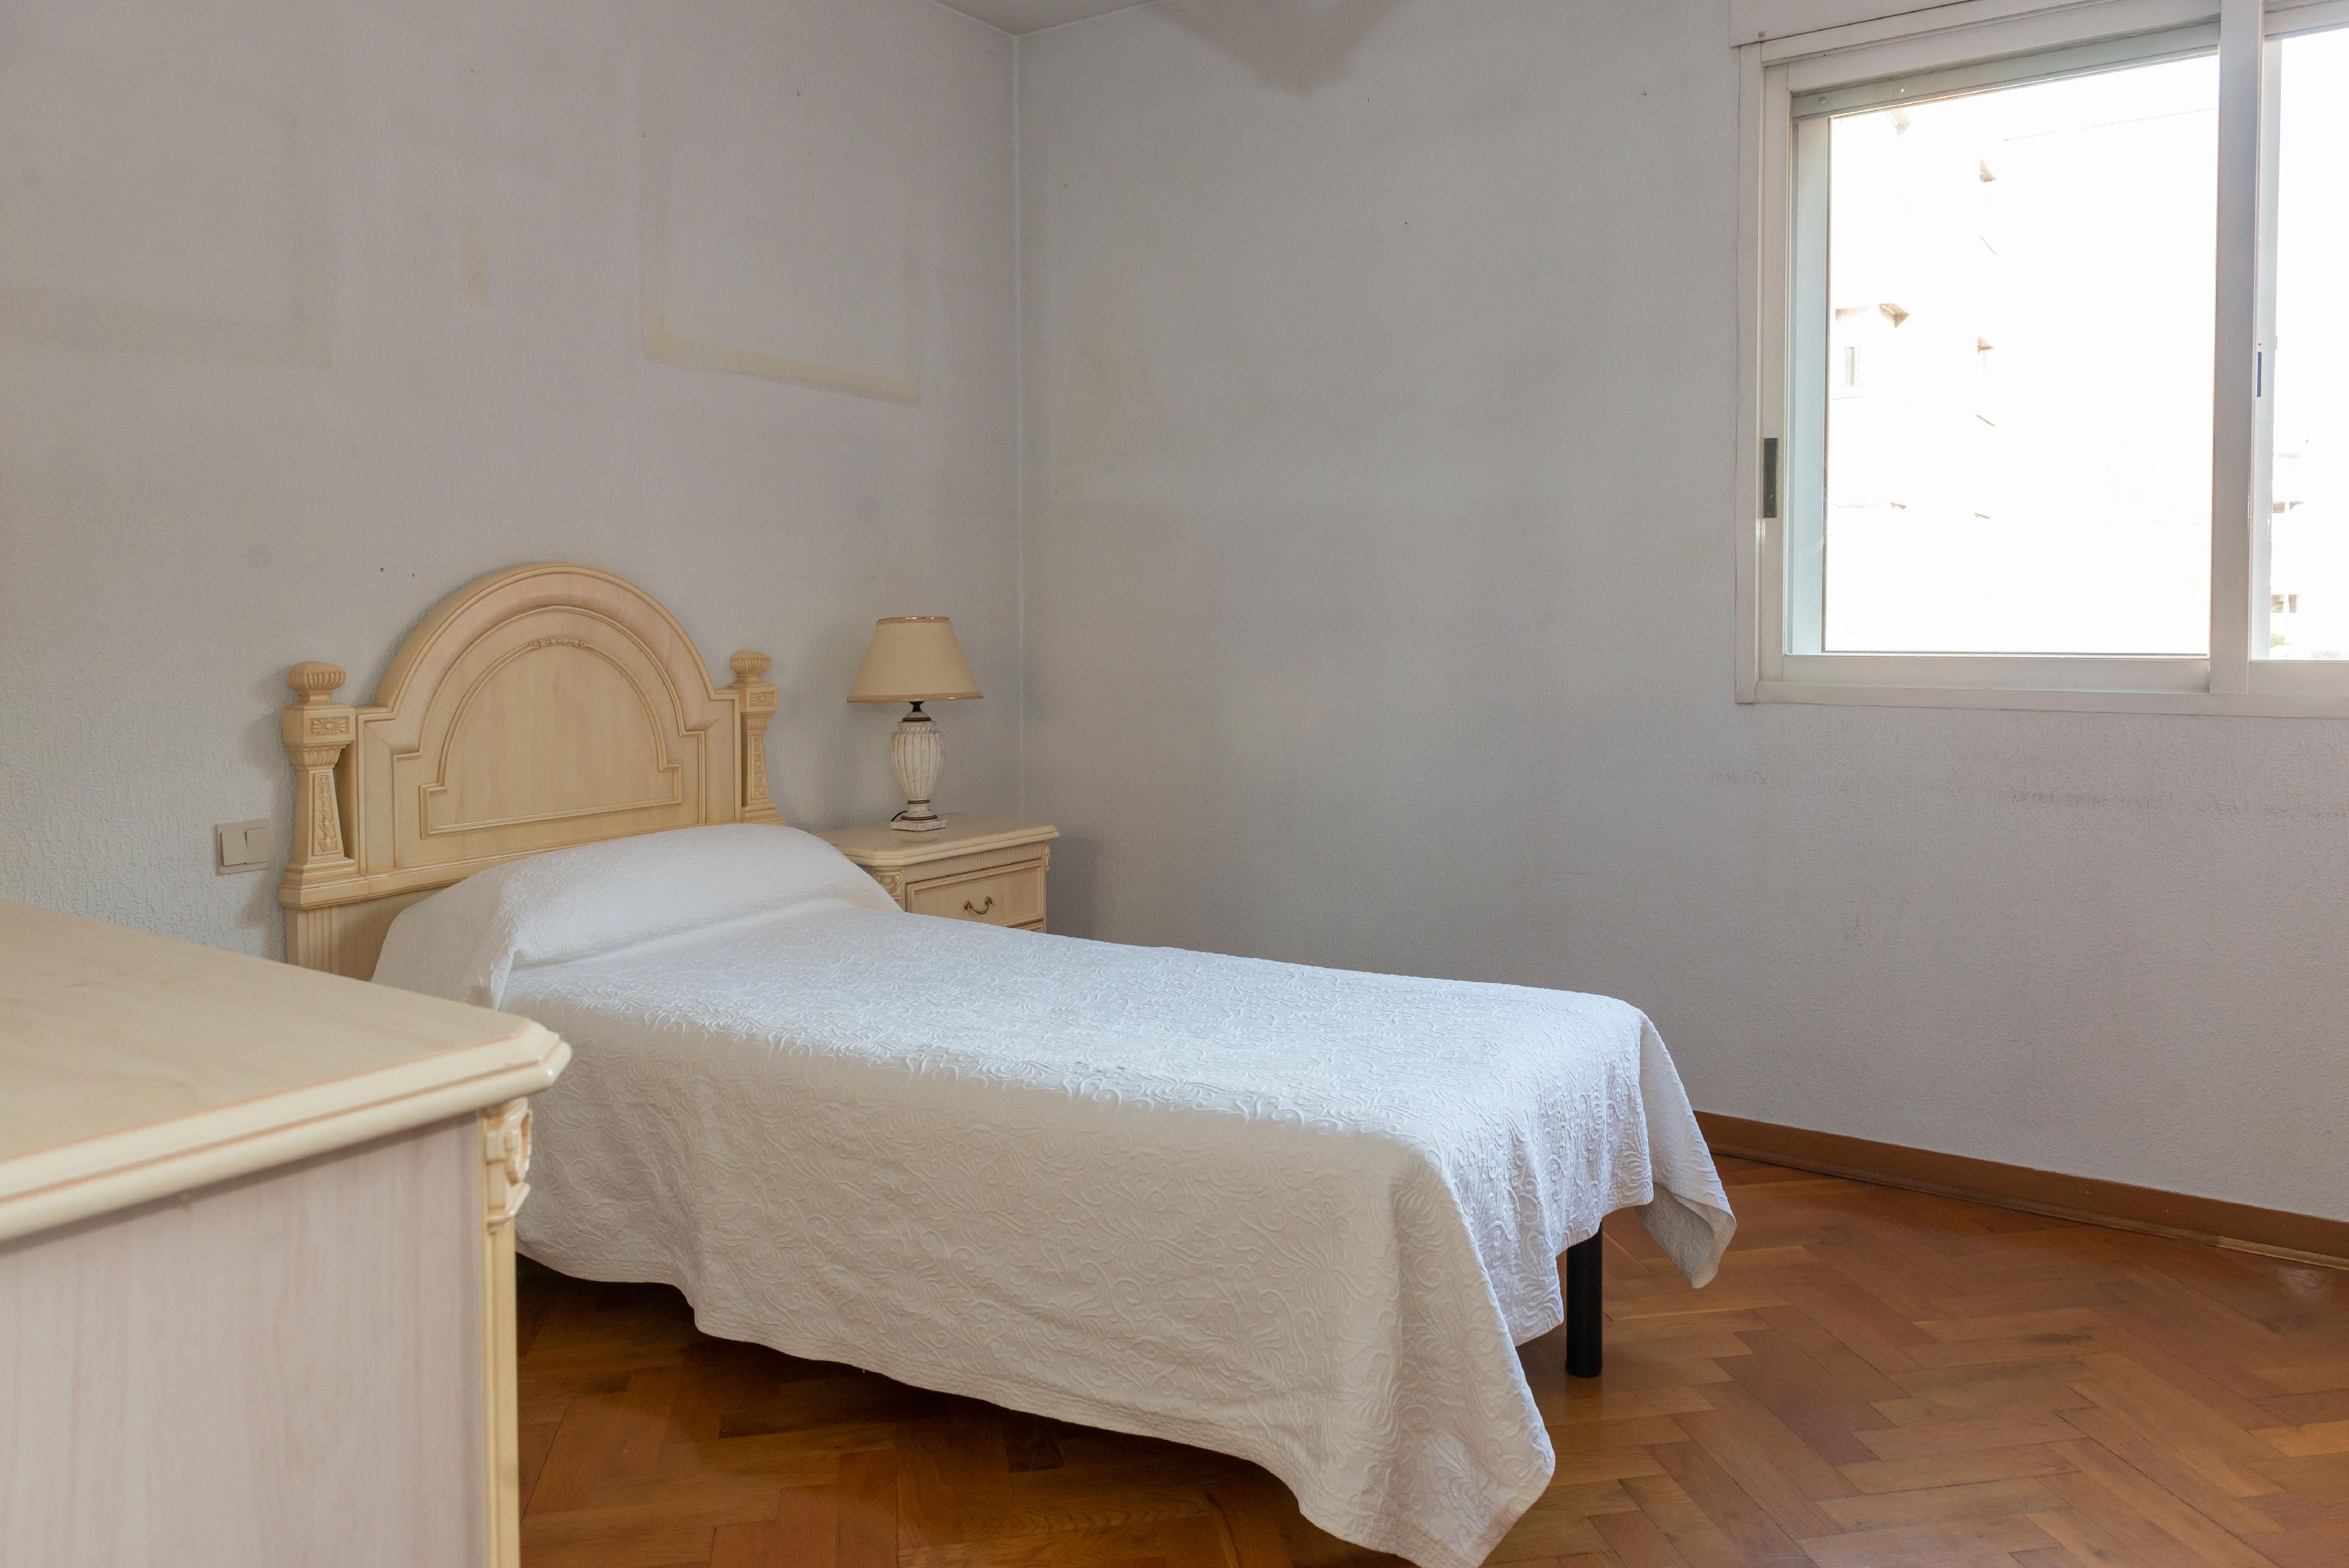 253899 Flat for sale in Sarrià-Sant Gervasi, Sant Gervasi-Galvany 30